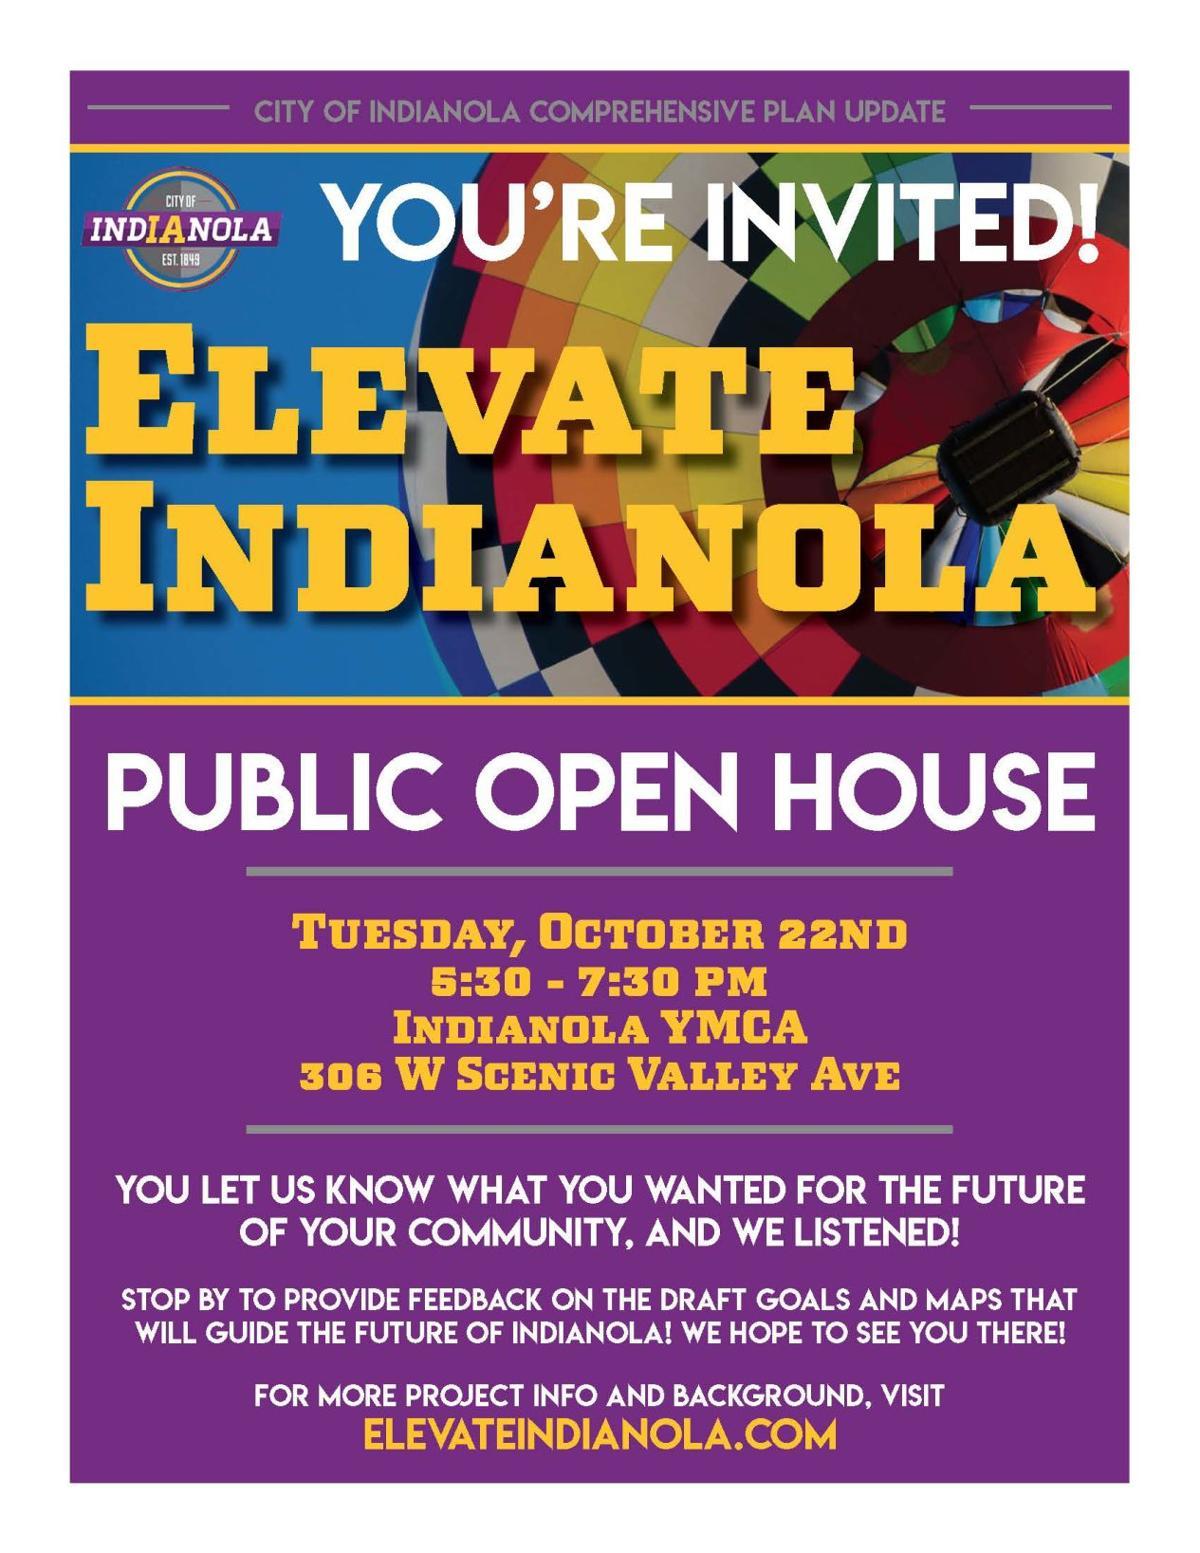 Indianola city survey invite